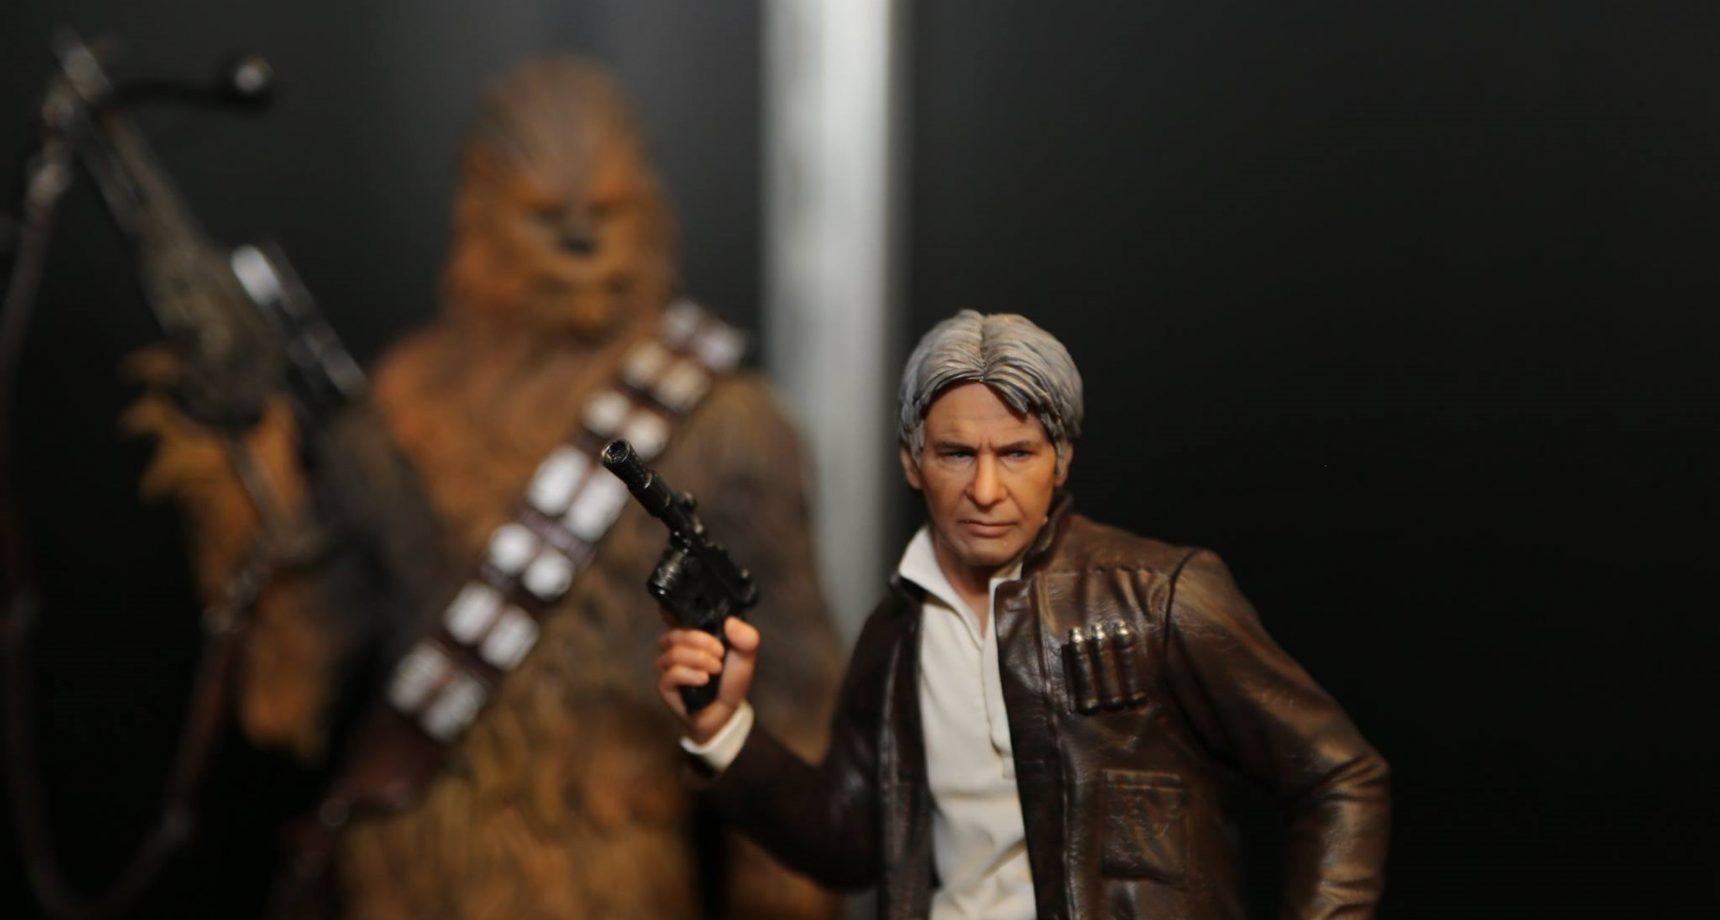 Kotobukiya ArtFX+ Han Solo & Chewbacca TFA Set ausgestellt